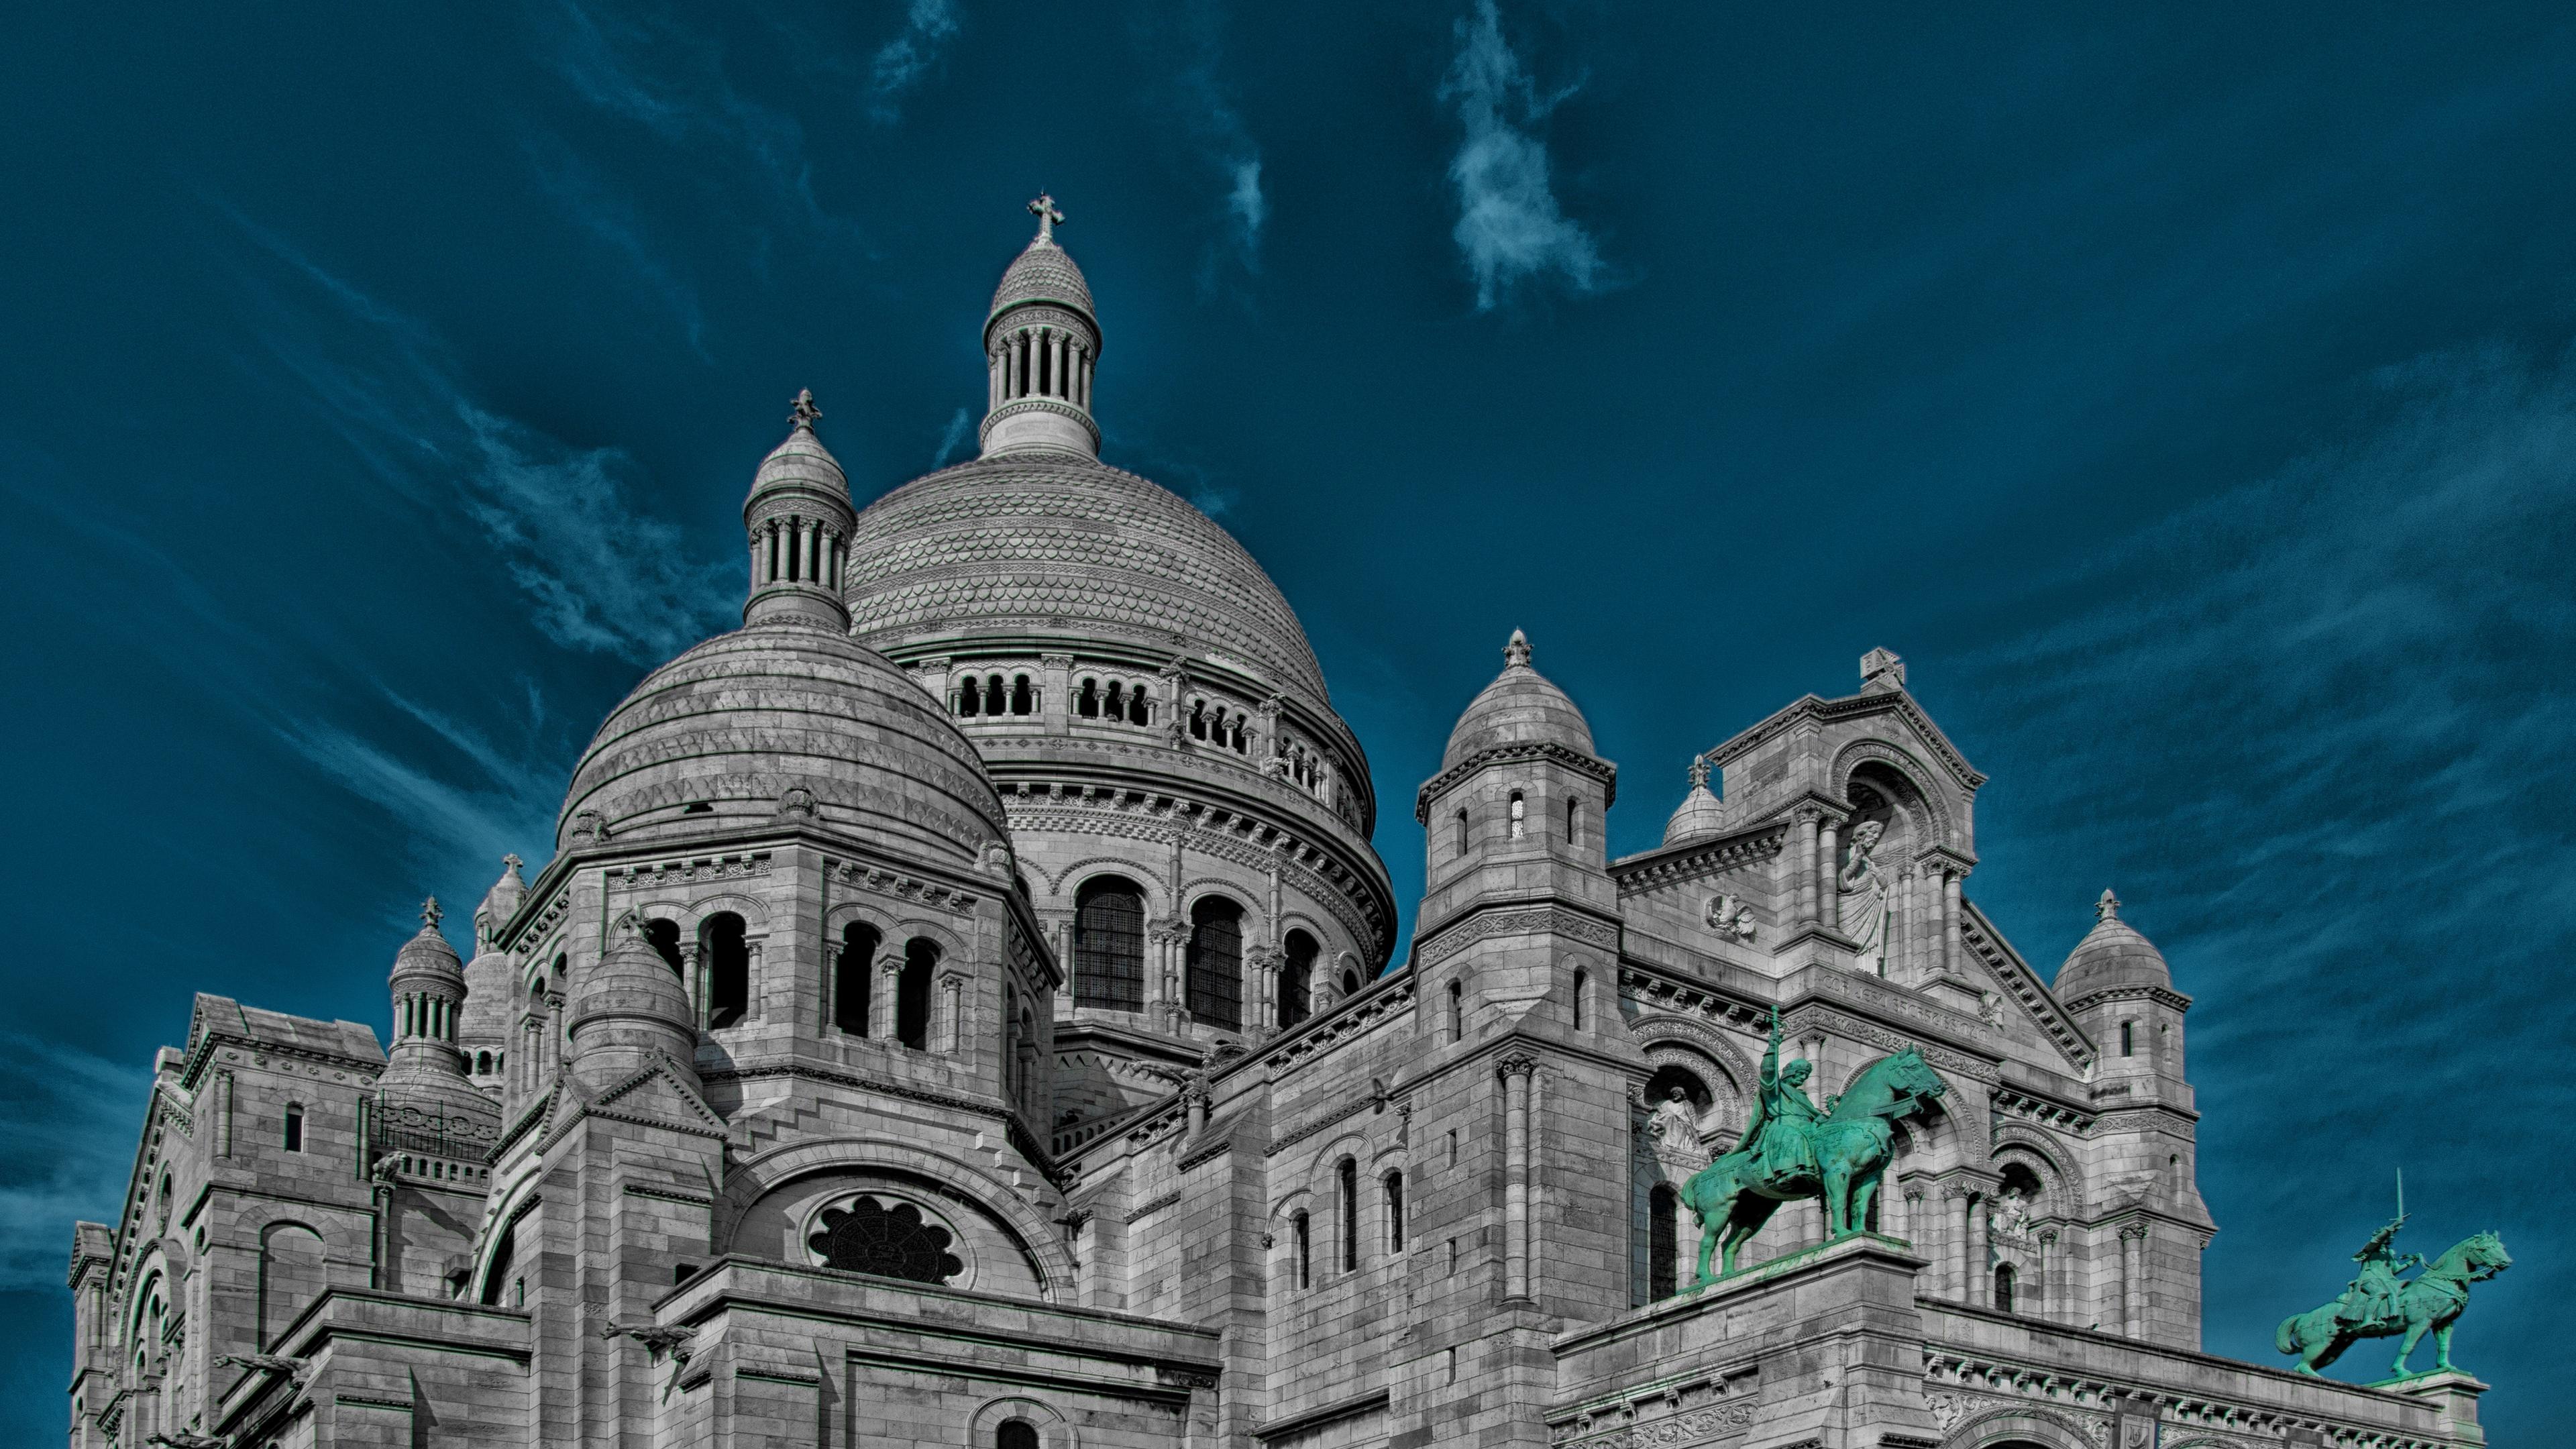 paris church france sky hdr 4k 1538068055 - paris, church, france, sky, hdr 4k - Paris, France, Church